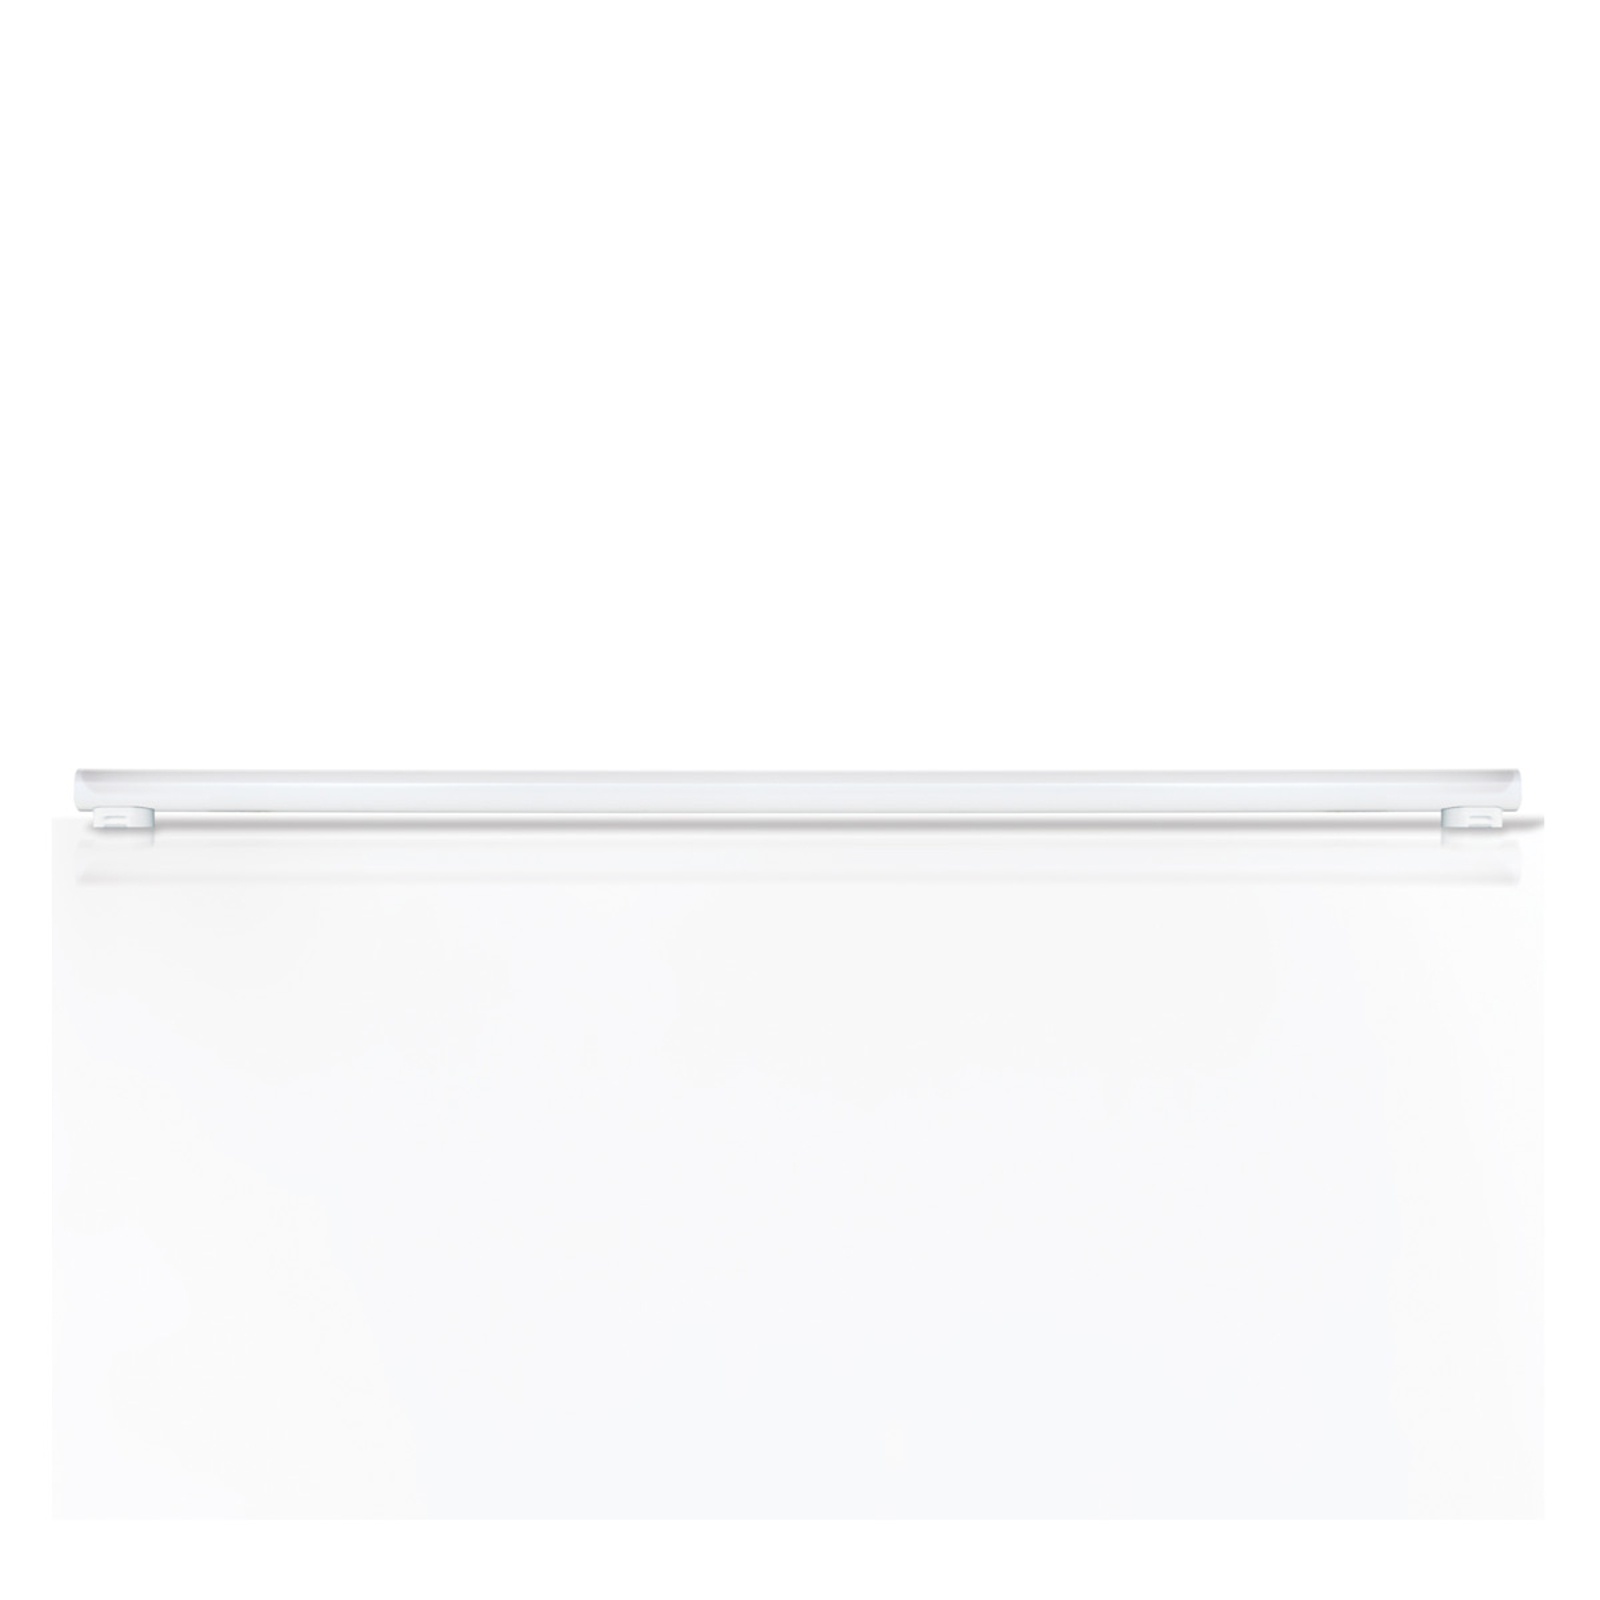 S14s 16W 827 LED lijnlamp